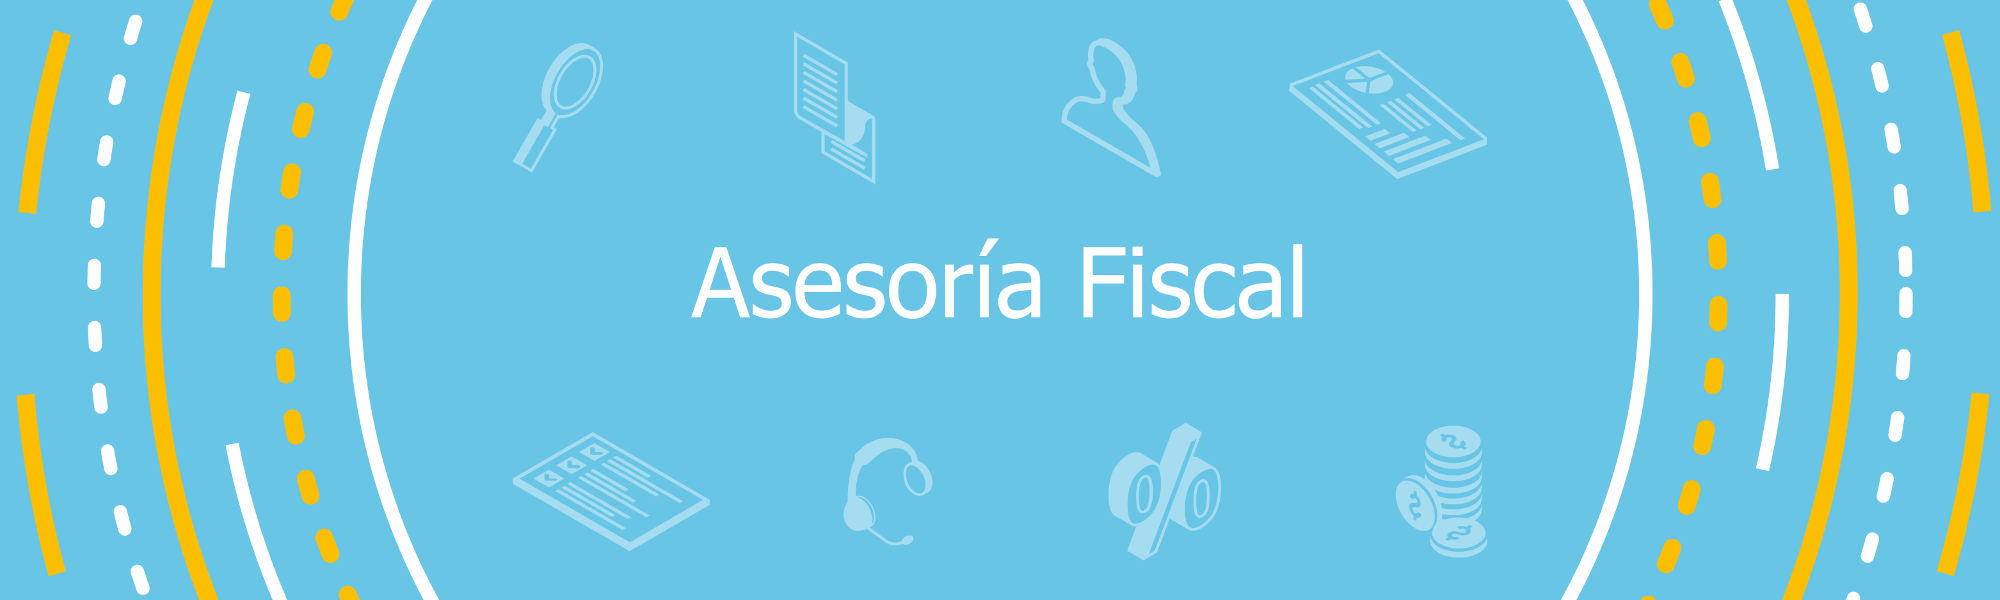 Asesoría Fiscal en Tenerife